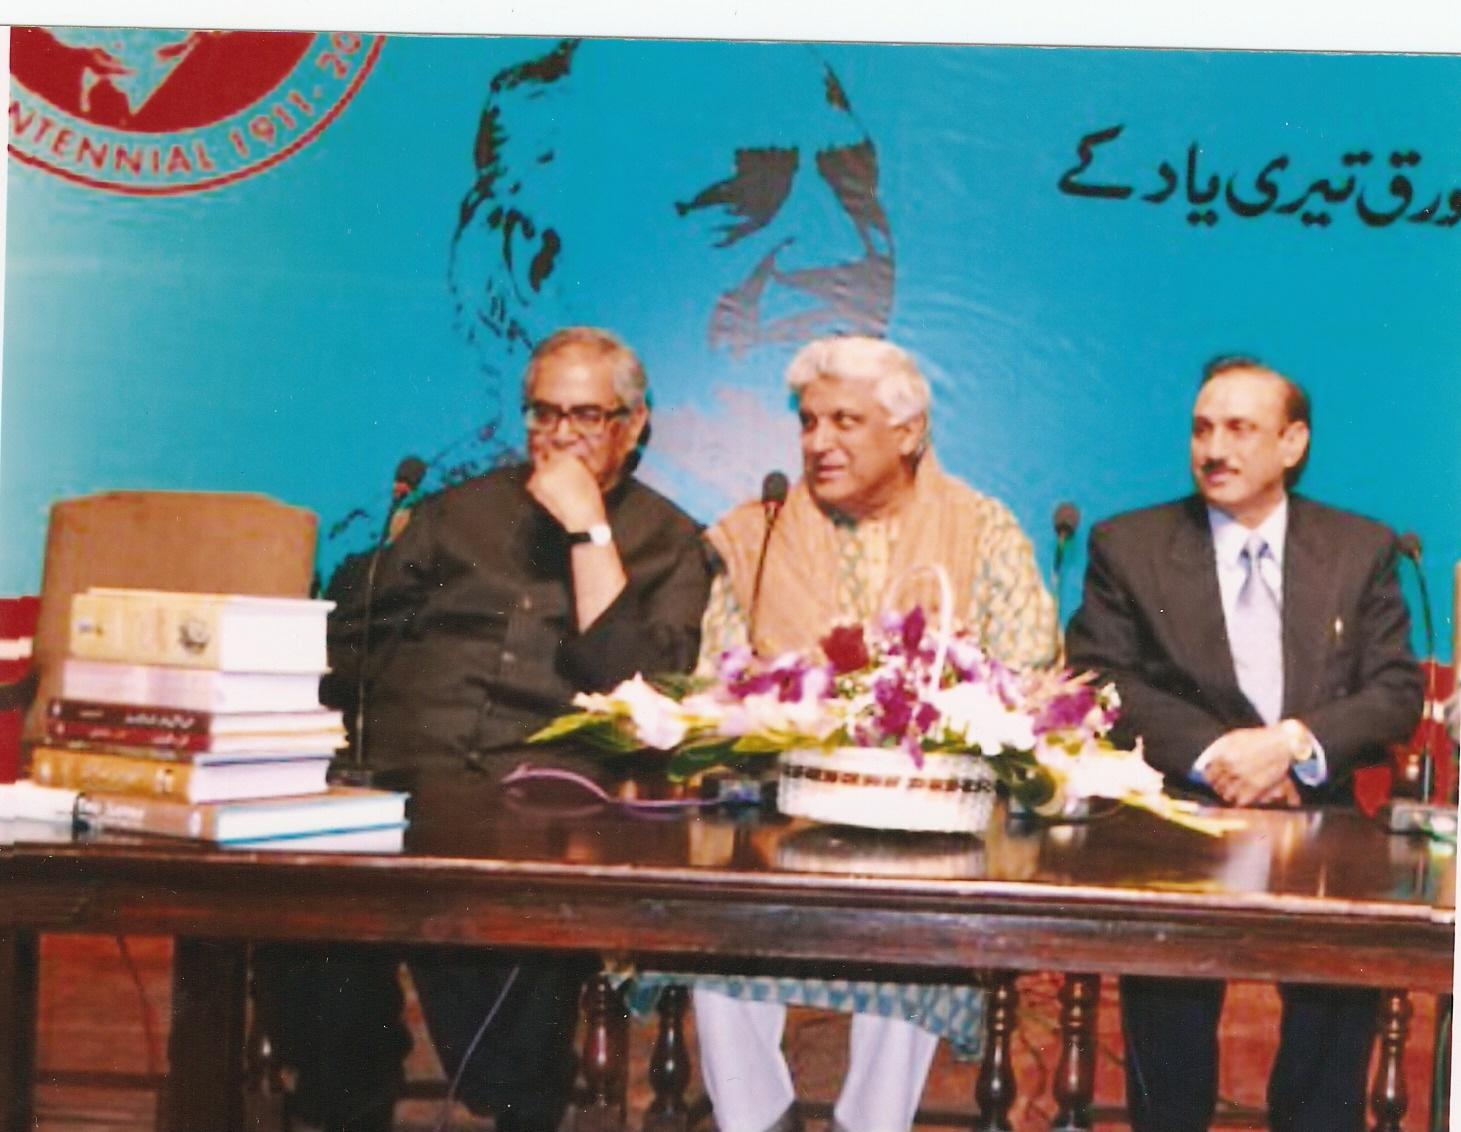 Ashfaq 2011 Javed Akhtar